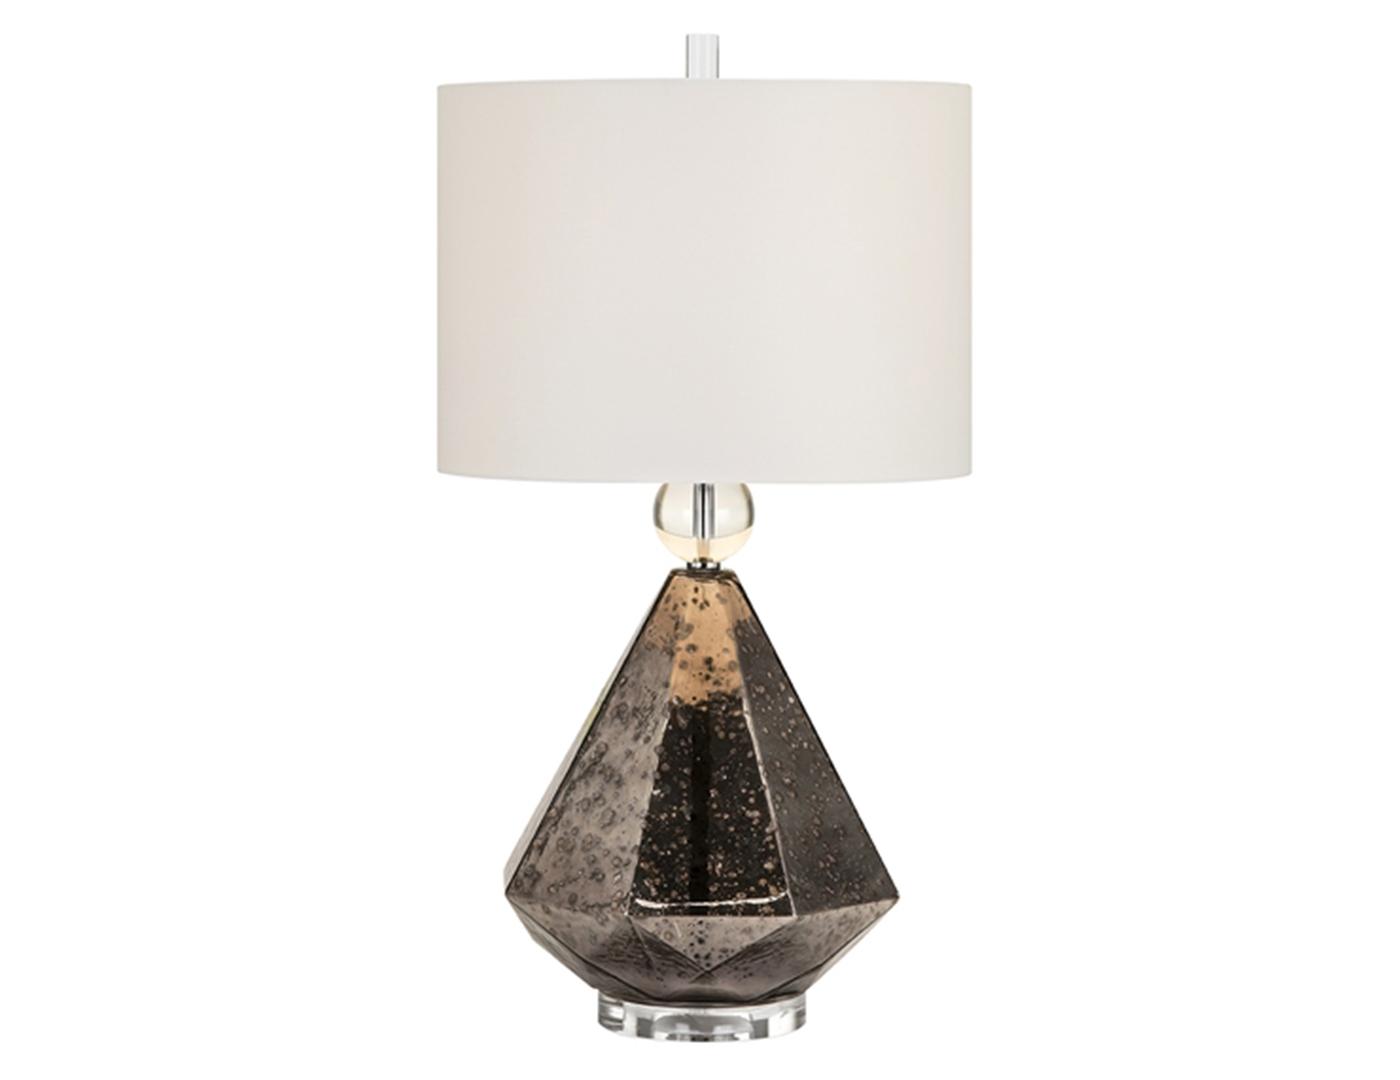 taupe mercury glass table lamp - Mercury Glass Table Lamp